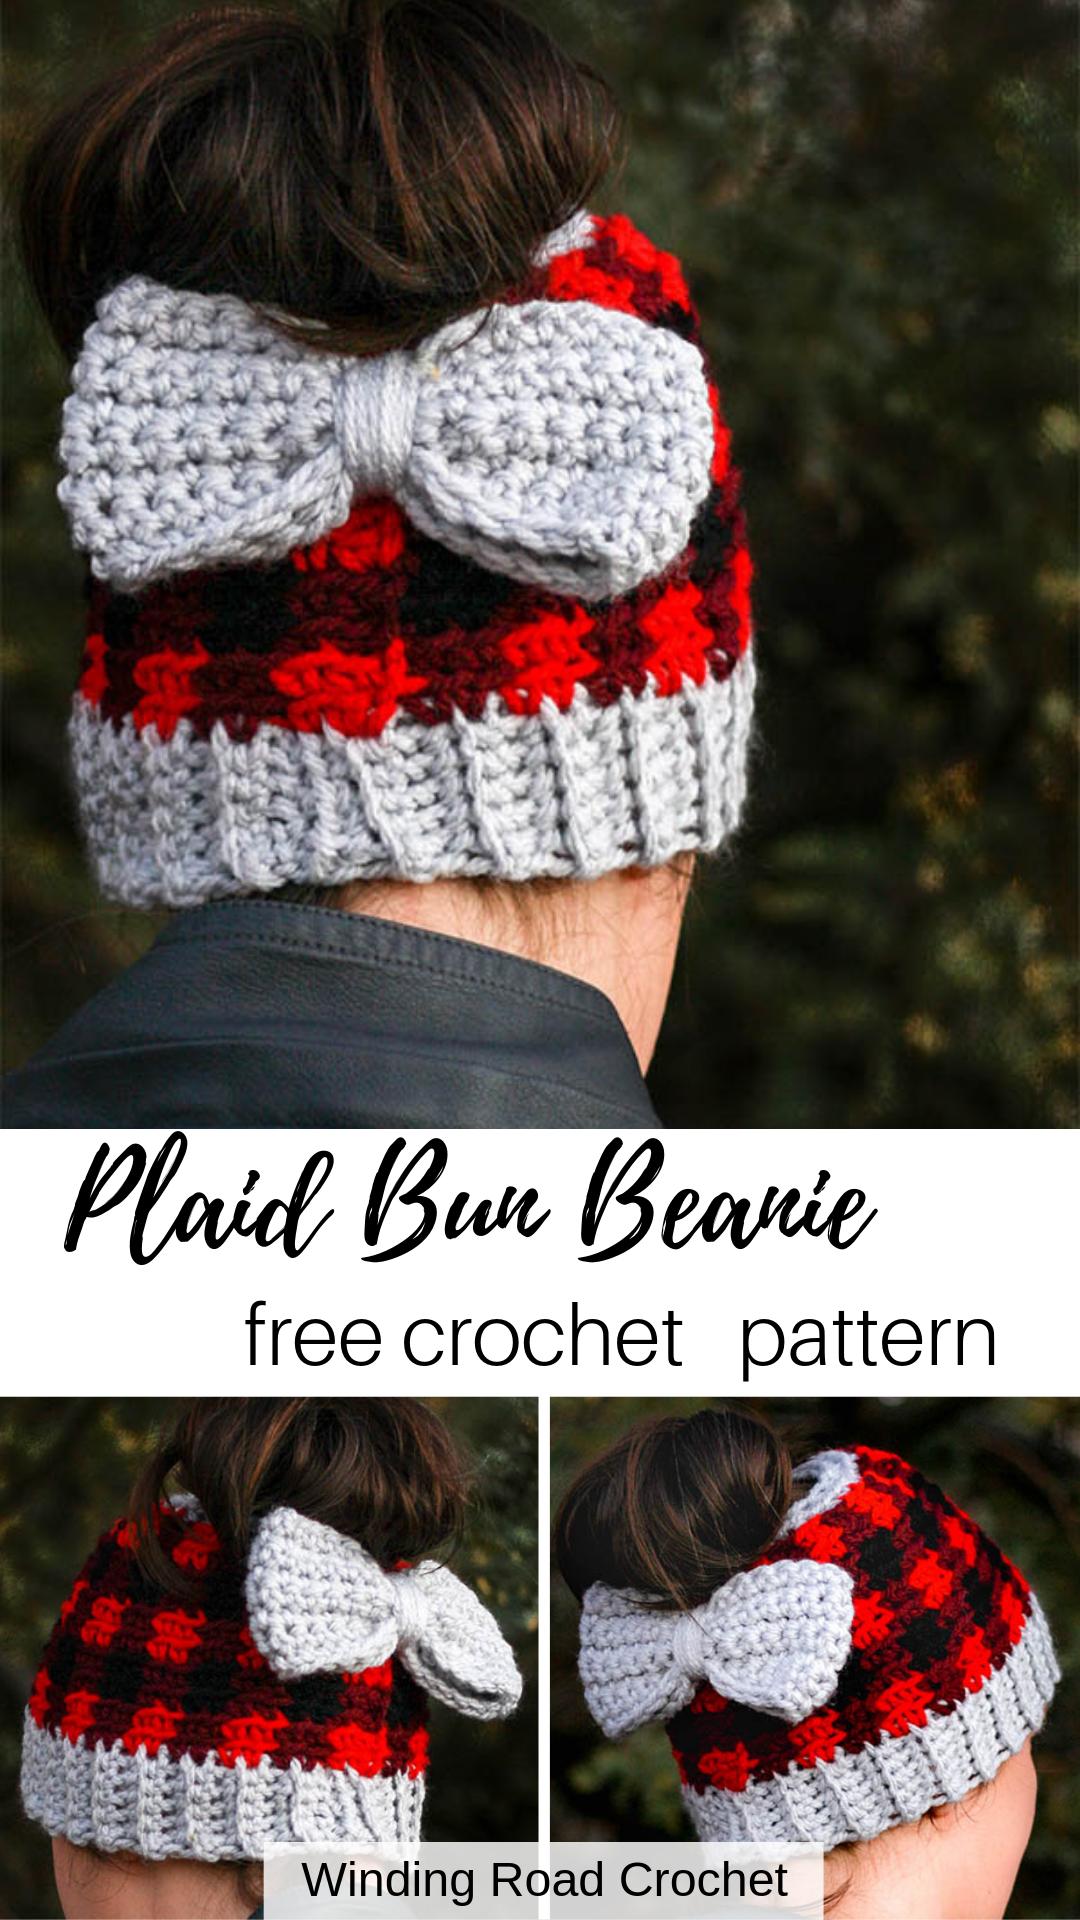 Chunky Plaid Bun Beanie – Winding Road Crochet